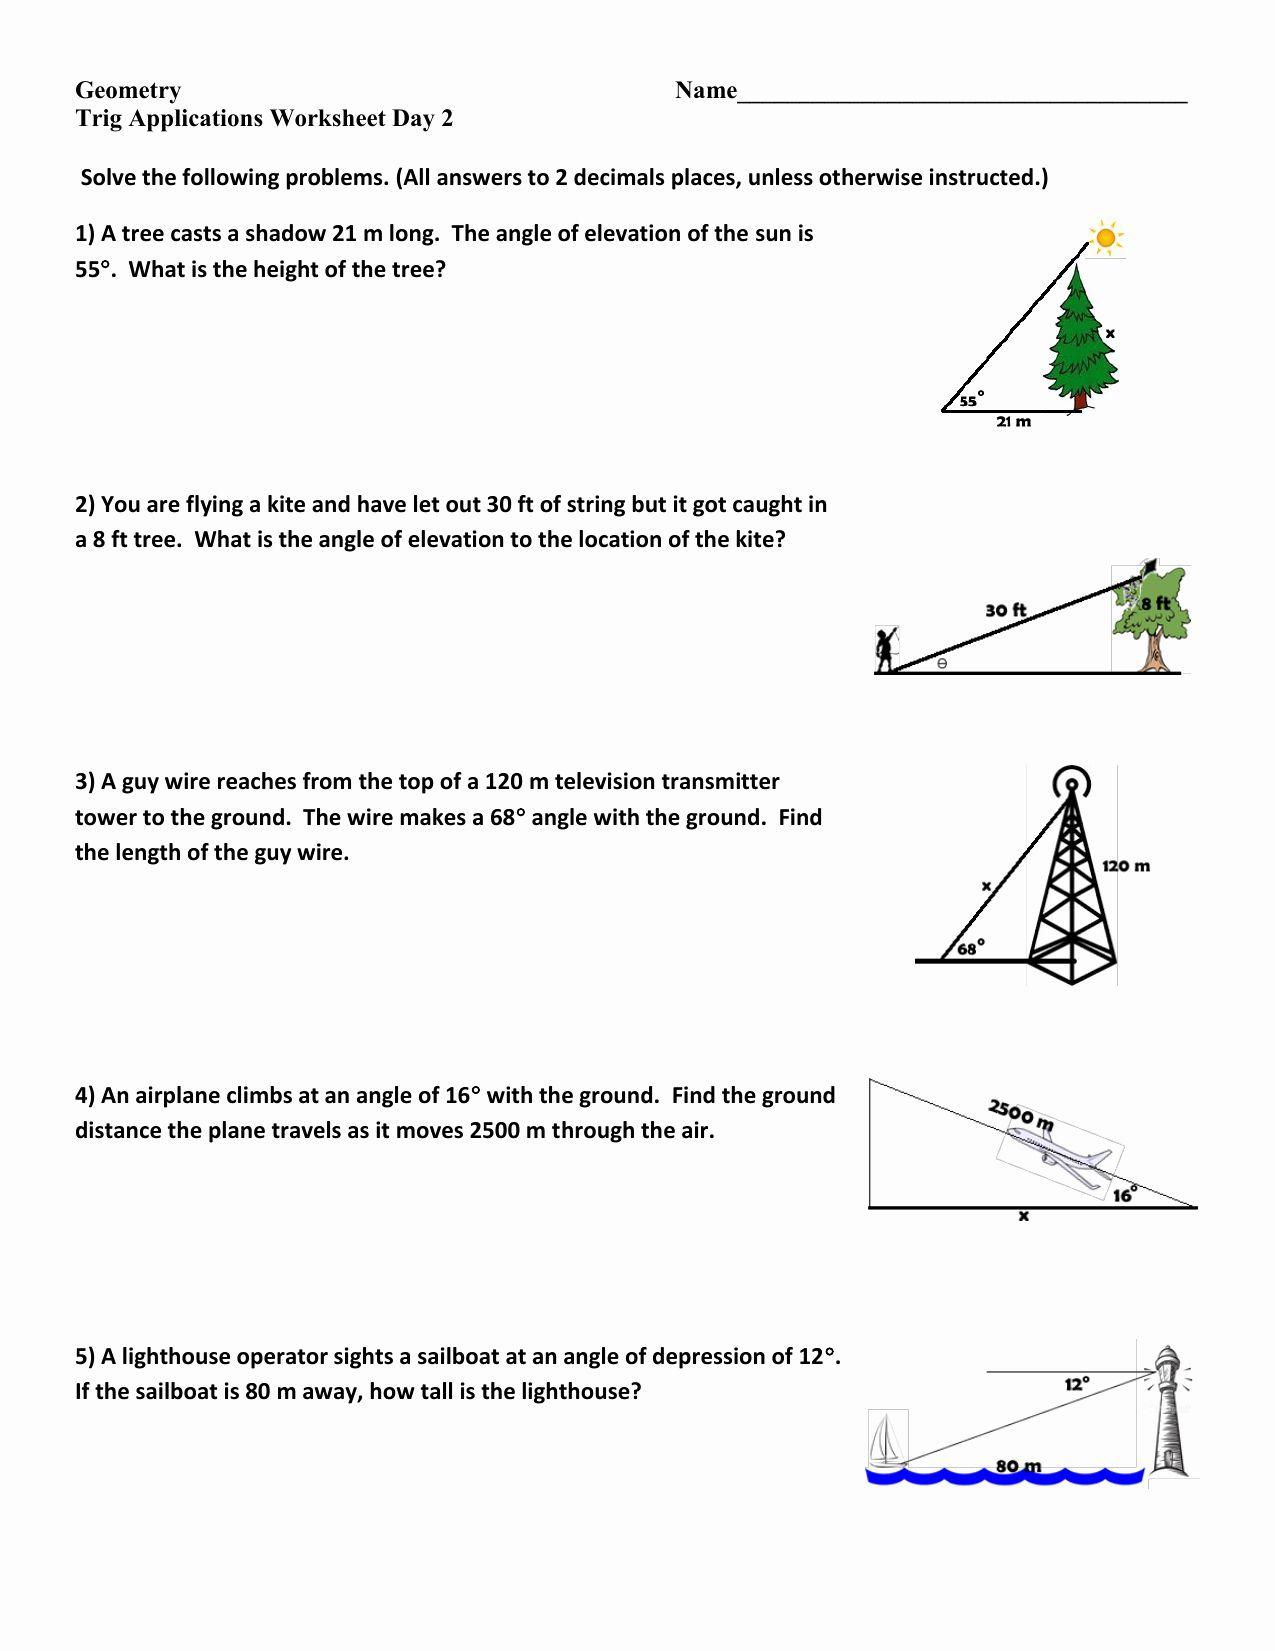 hight resolution of Right Triangle Trigonometry Worksheet Luxury Trigonometry Word Problems  Worksheets with Answers   Trigonometry worksheets